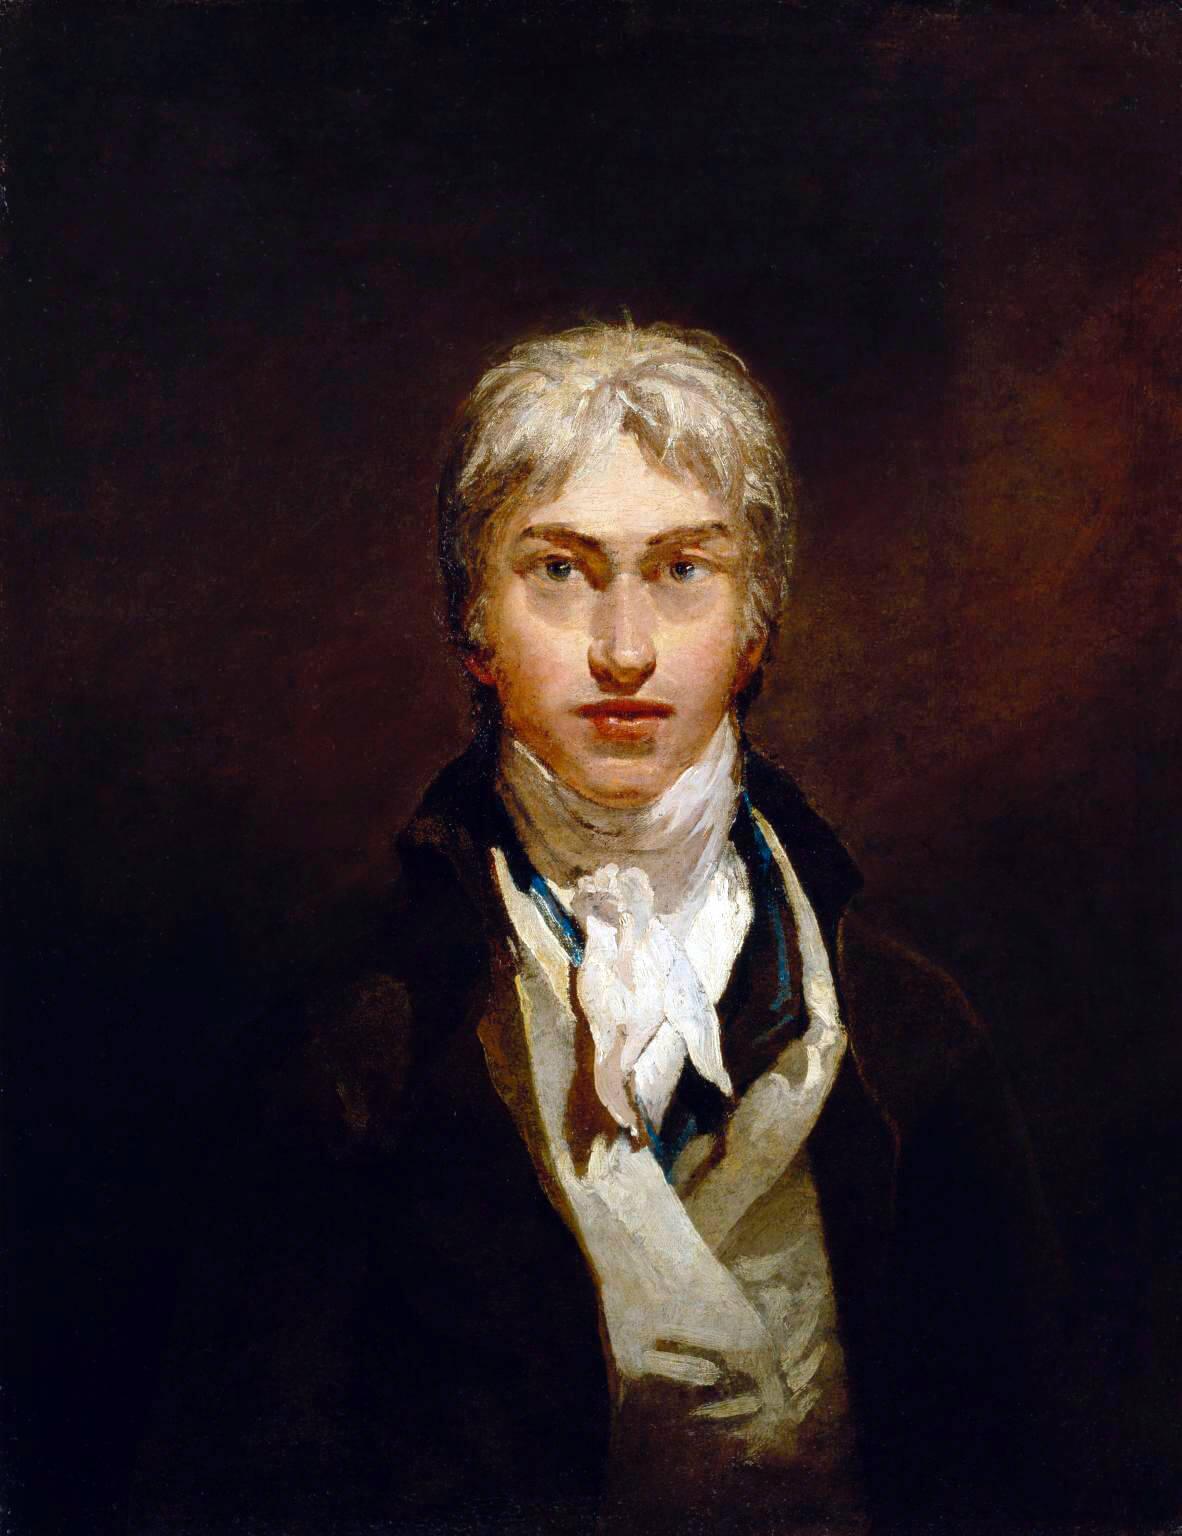 William Turner. Self-portrait. 1799.